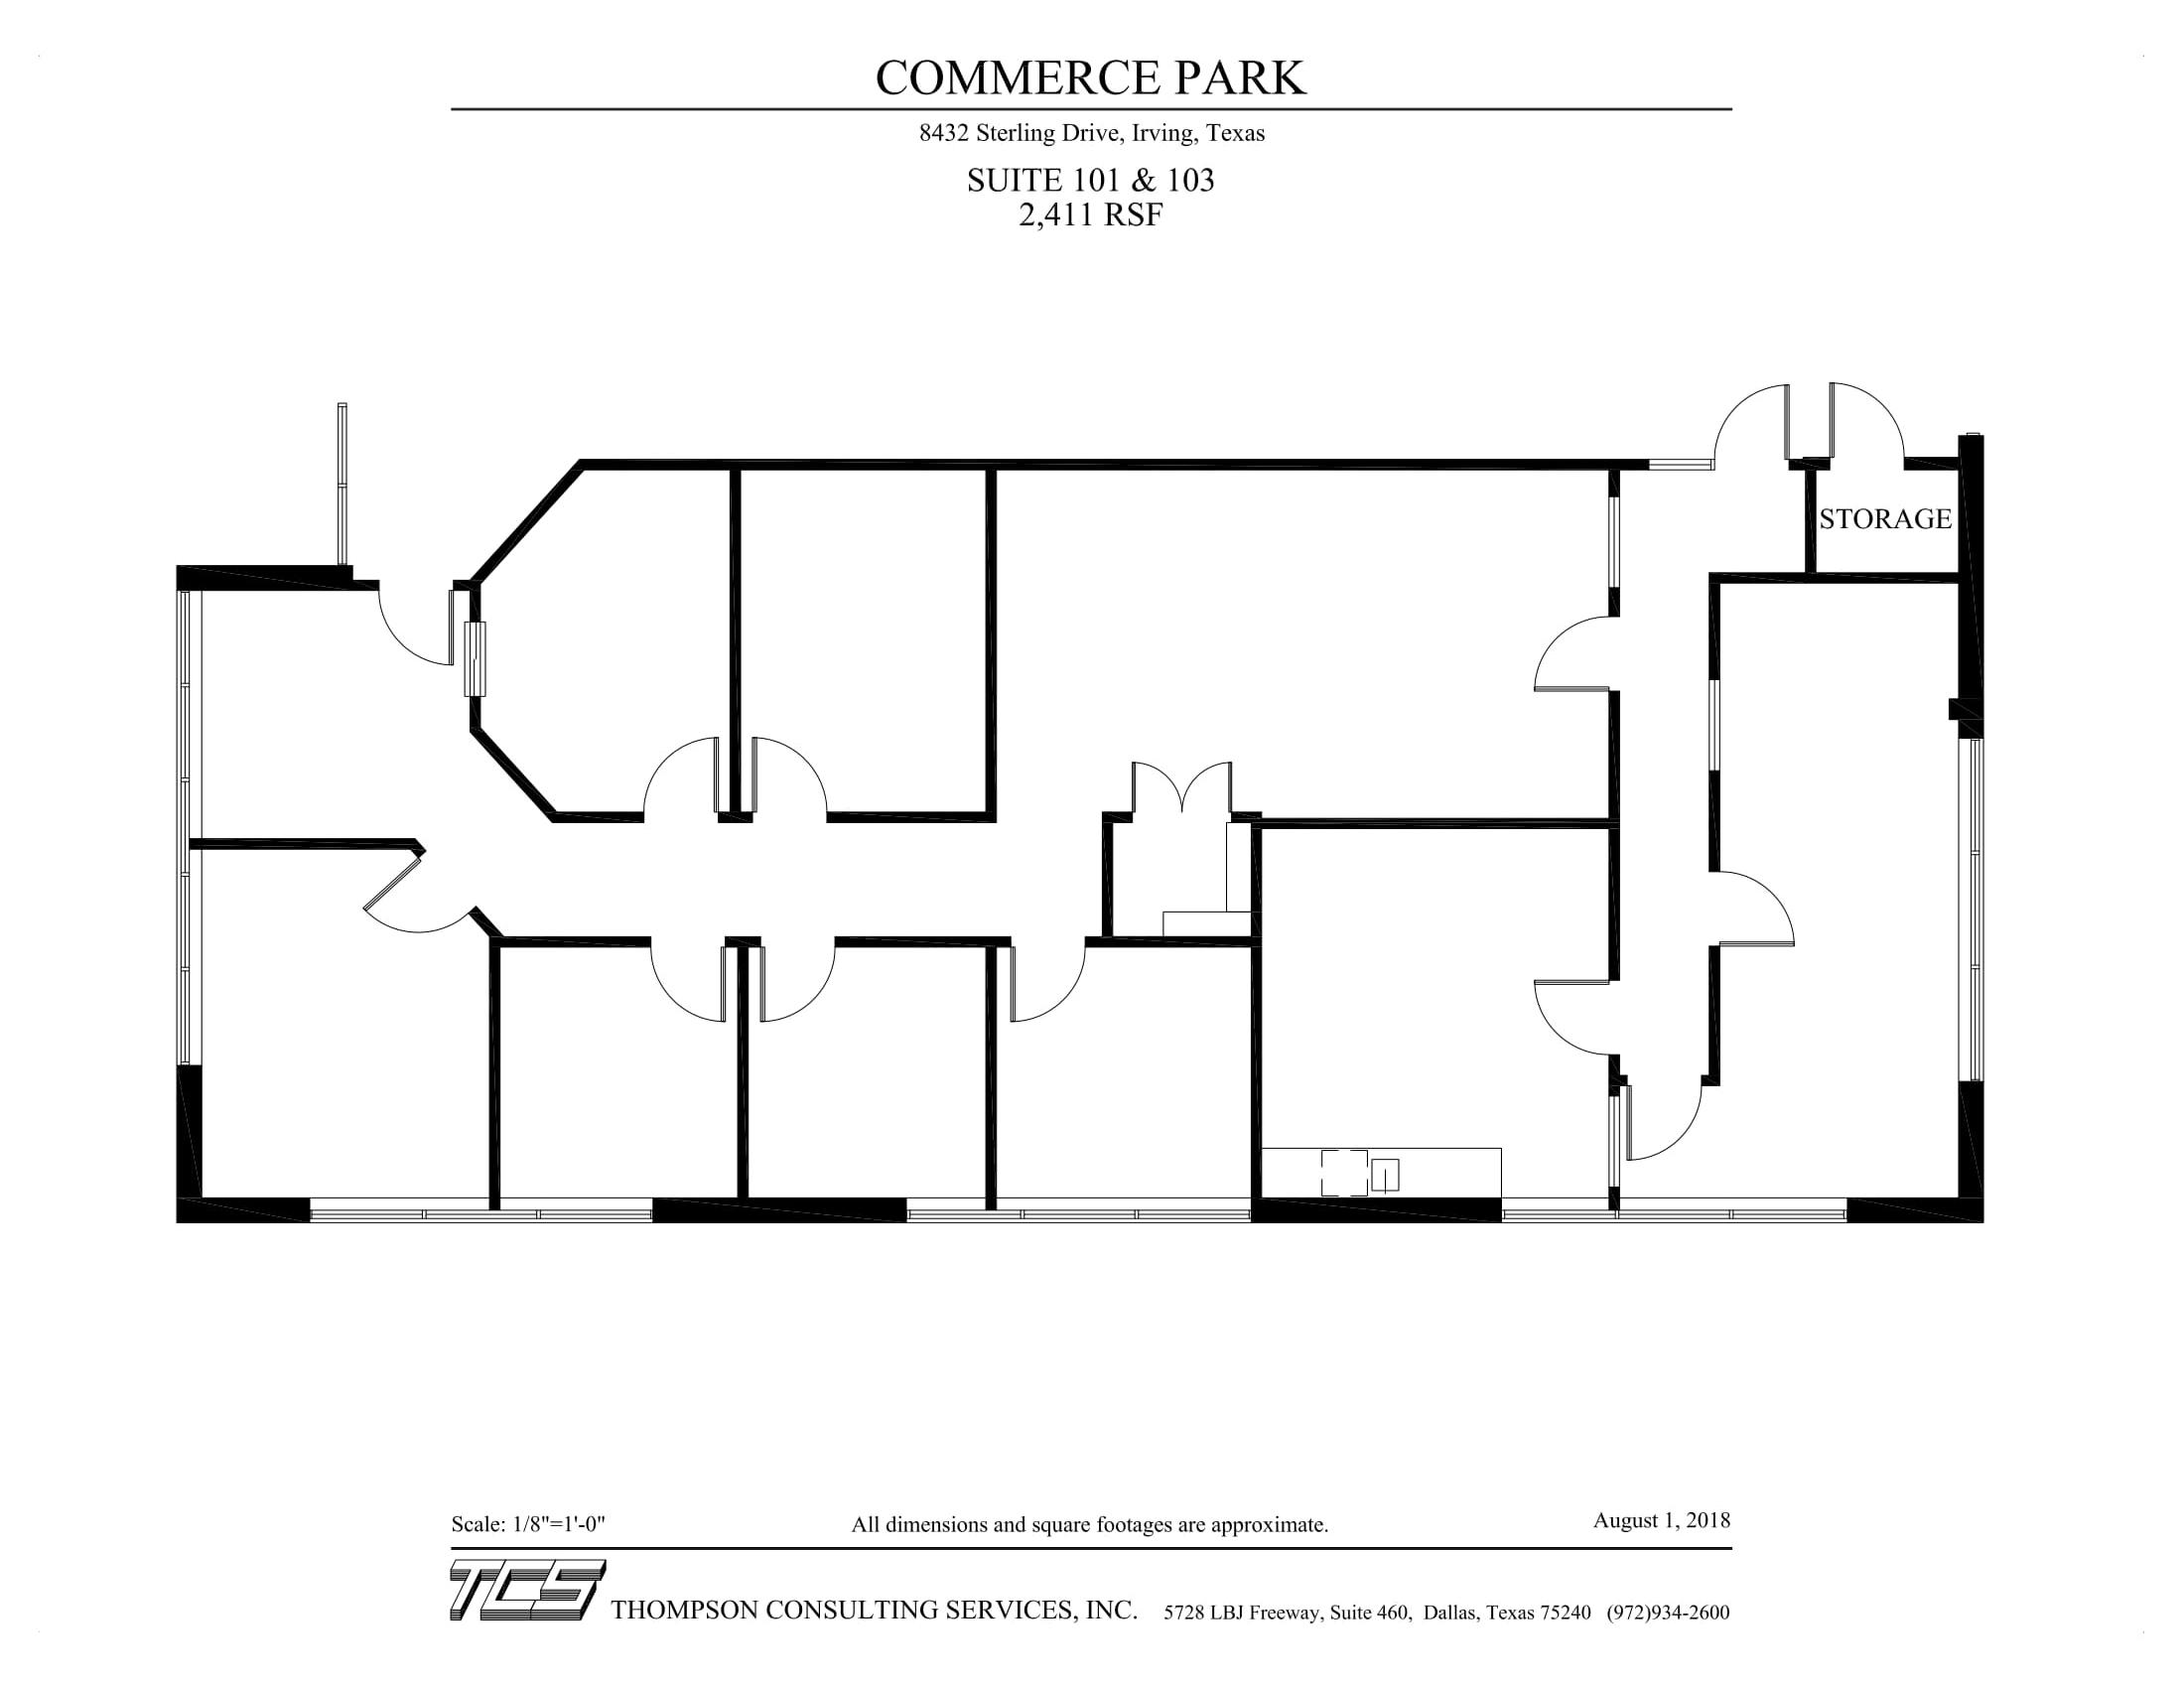 Commerce Park - 8432 Sterling - Suite 101 & 103 - Marketing Plan (8-1-18)-1